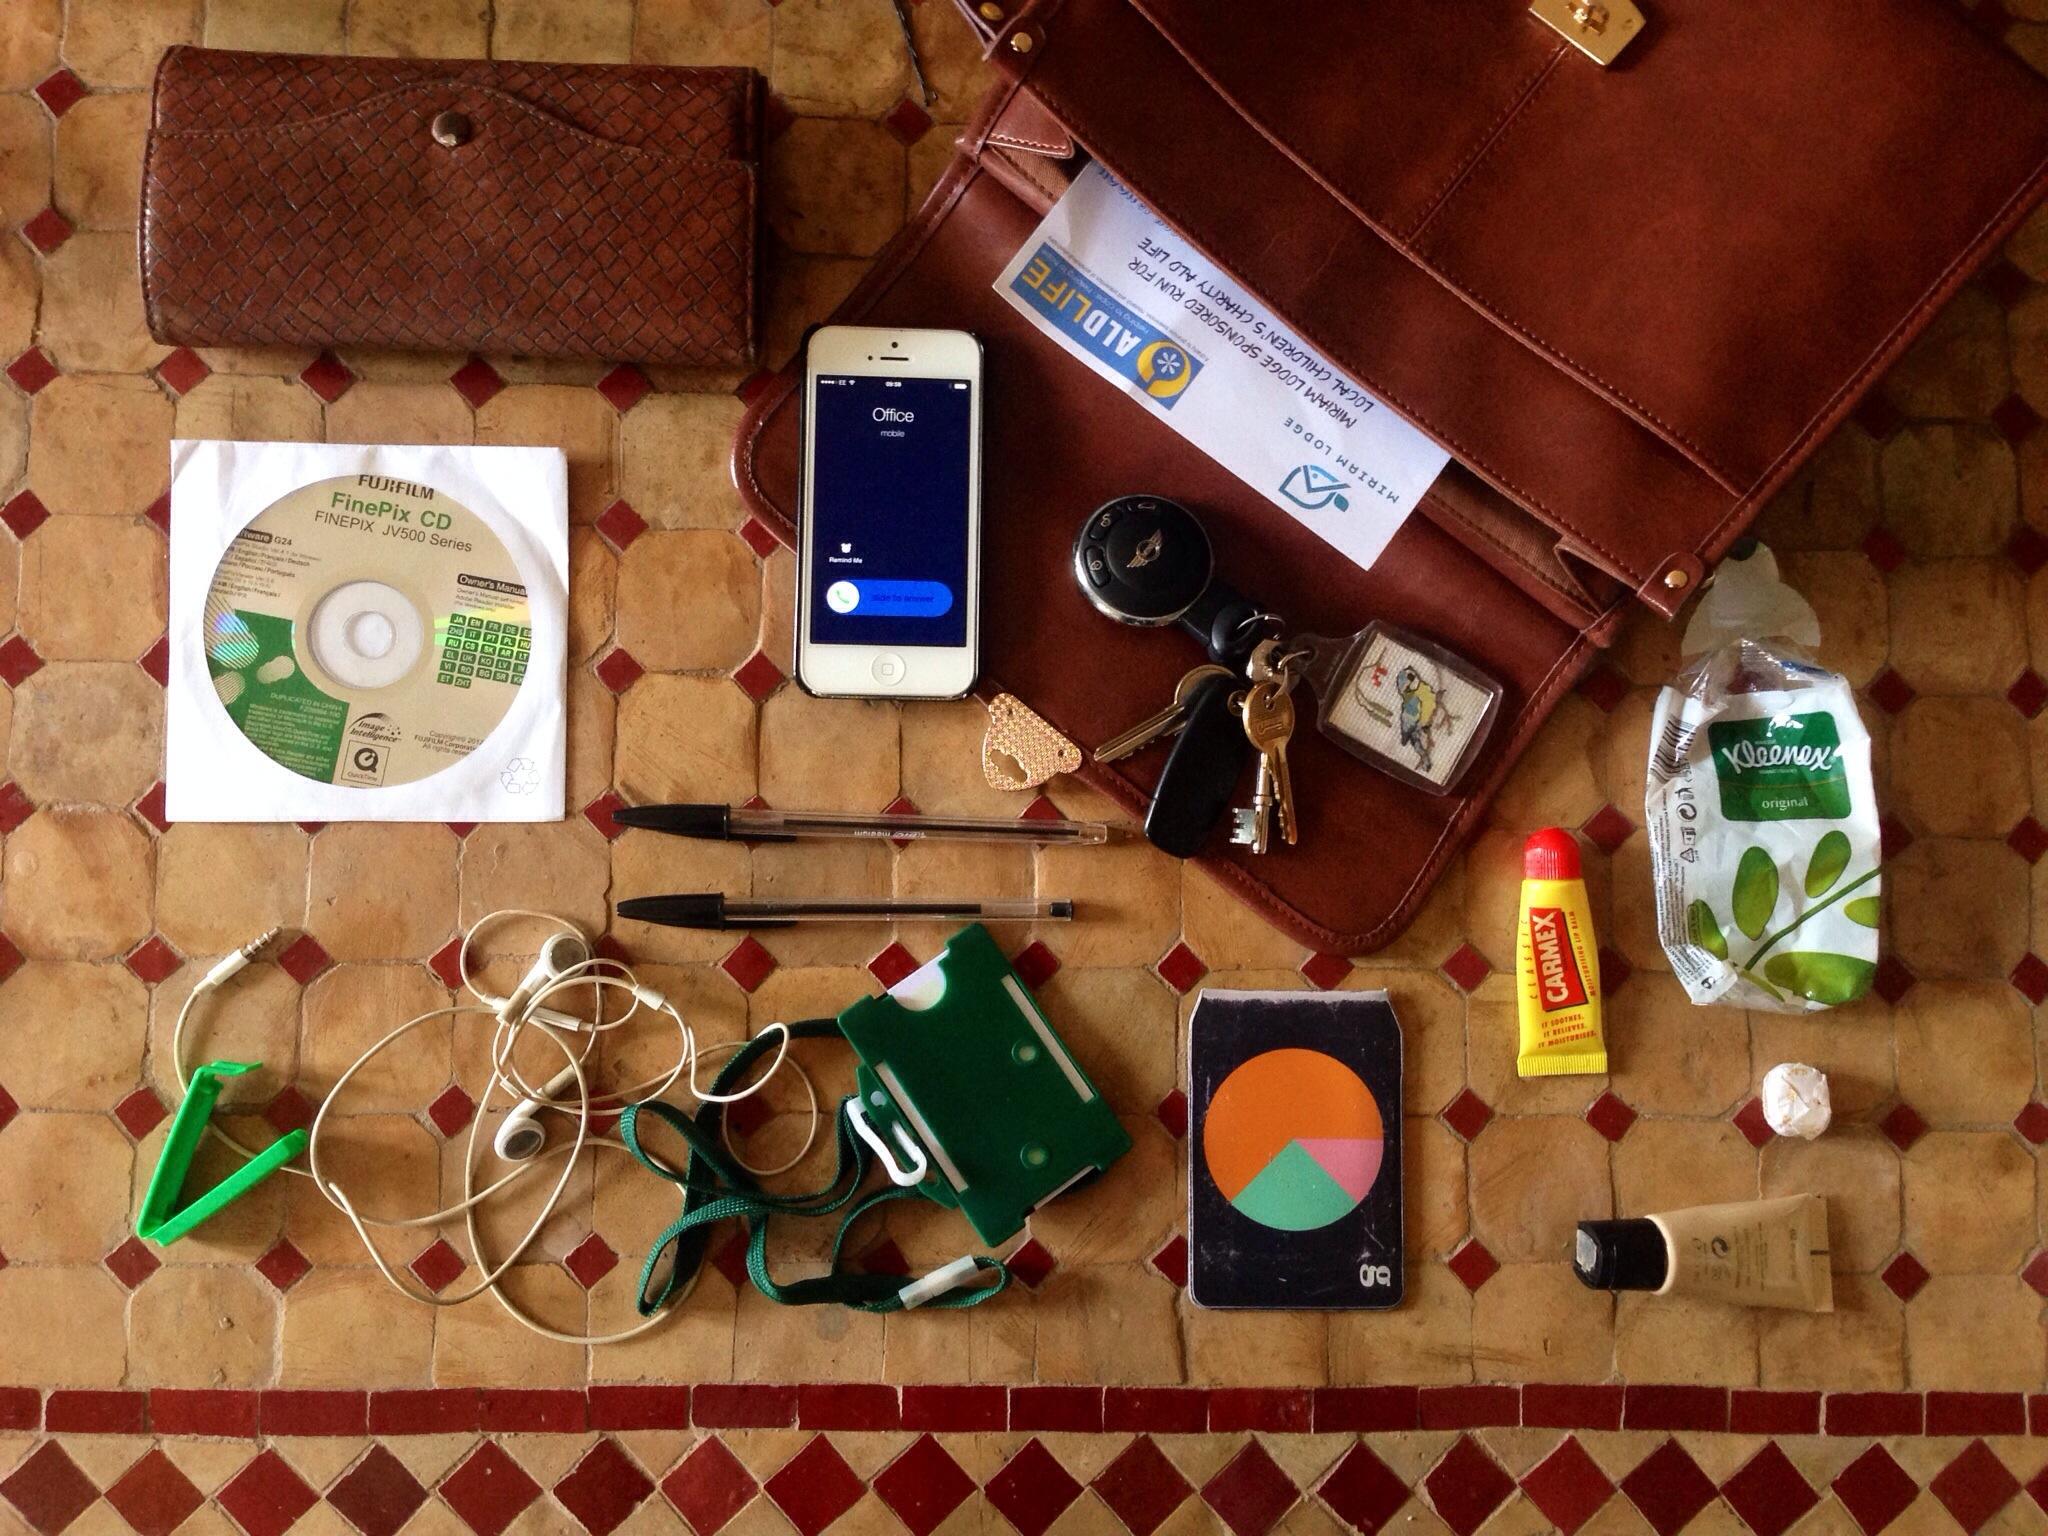 Mariam's handbag